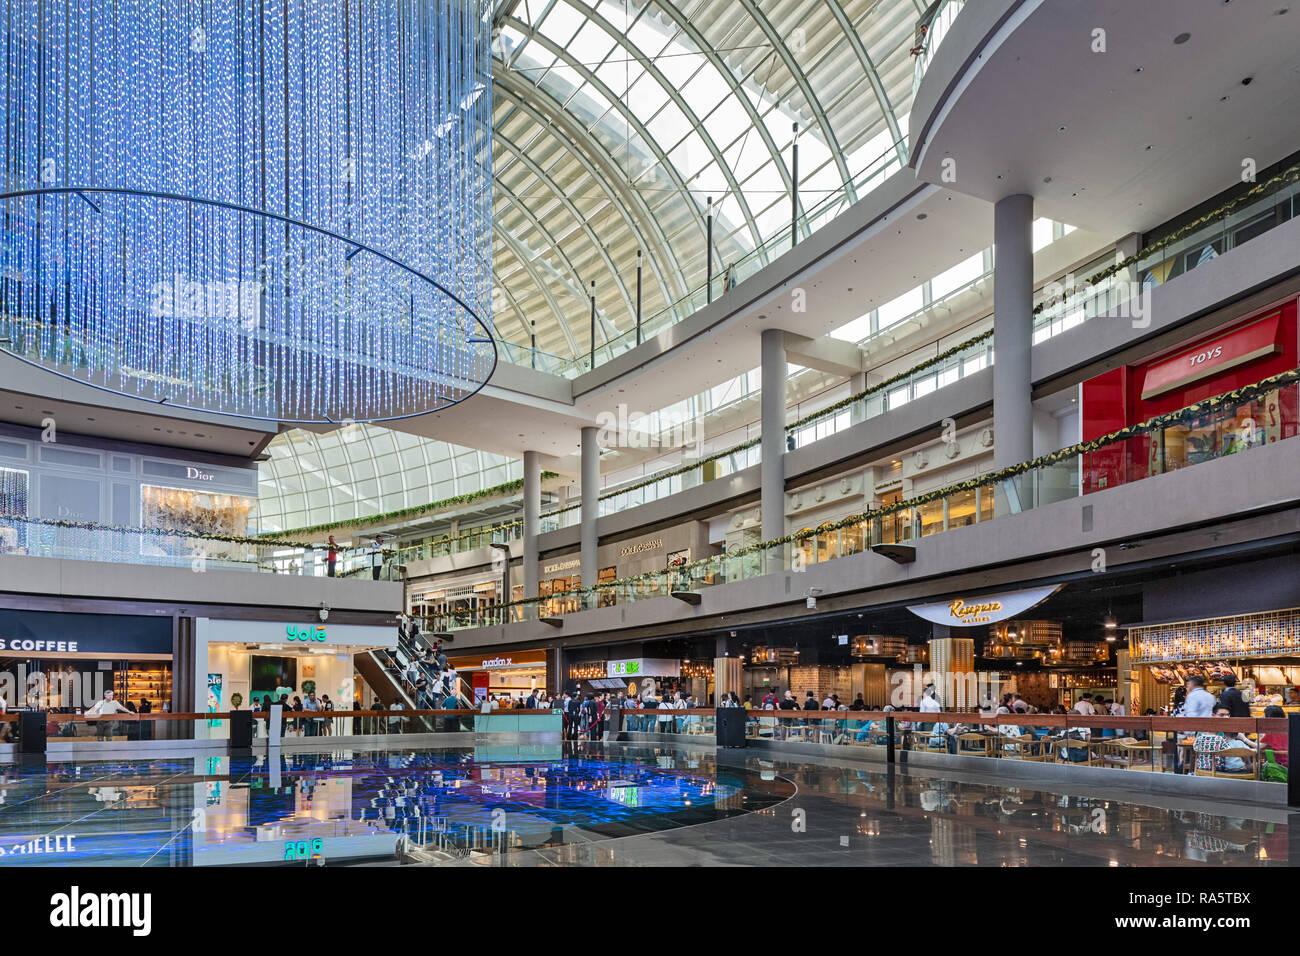 The Shoppes at Marina Bay Sands - Singapore - Stock Image